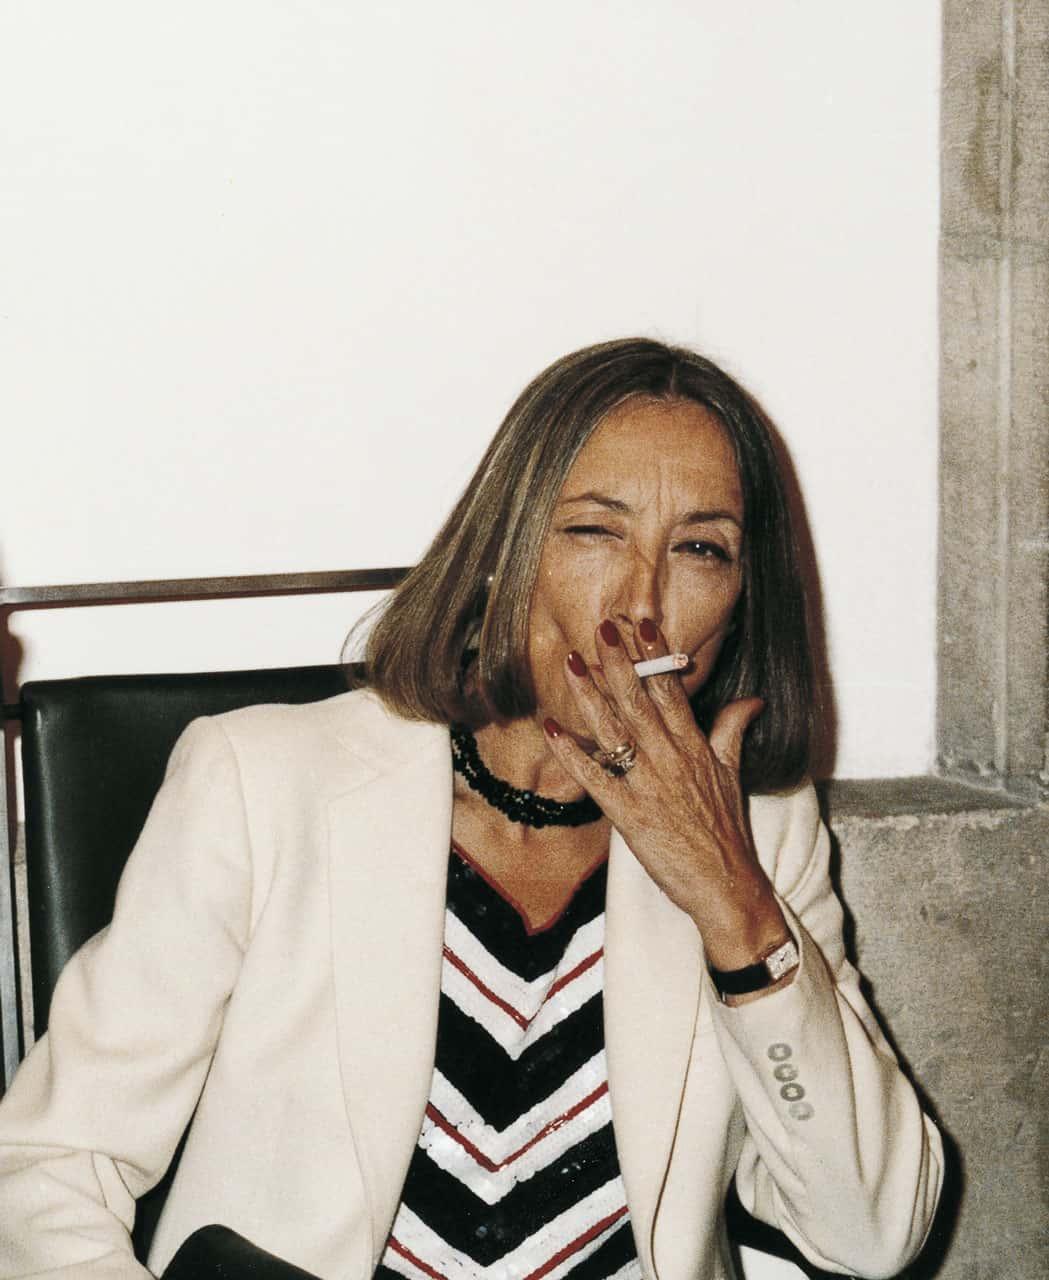 periodista Oriana Fallaci